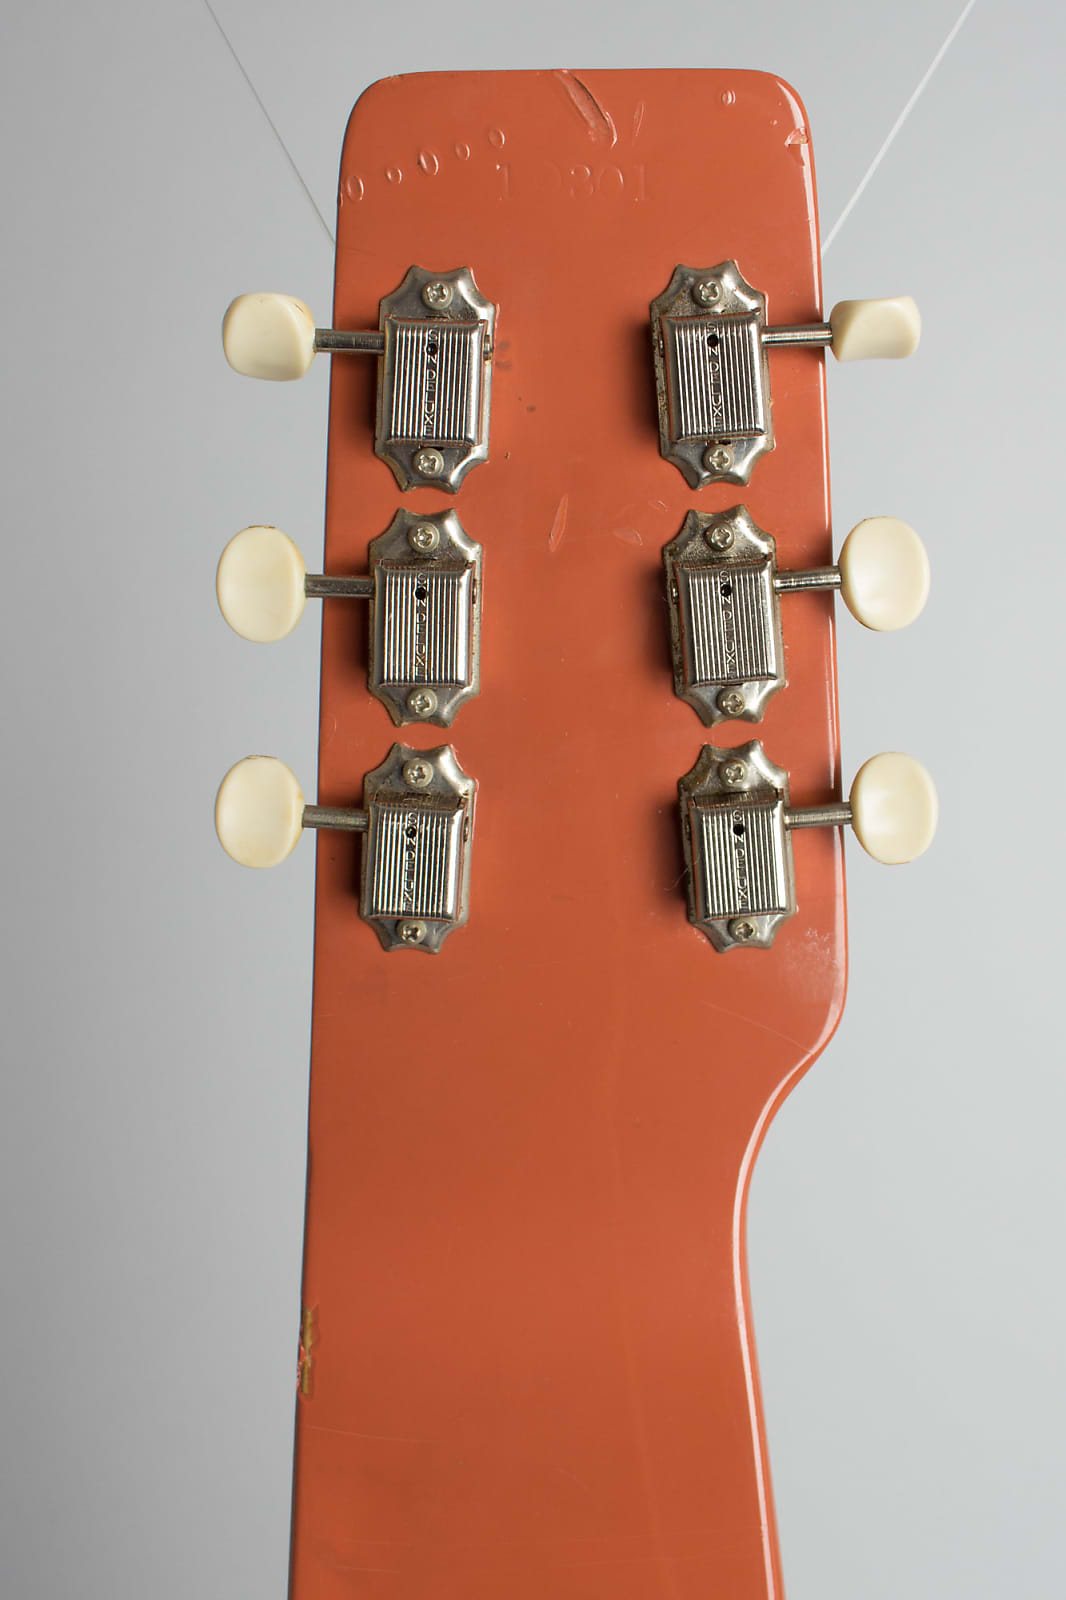 Gibson  Century-6 Lap Steel Electric Guitar (1961), ser. #10301, original tweed hard shell case.